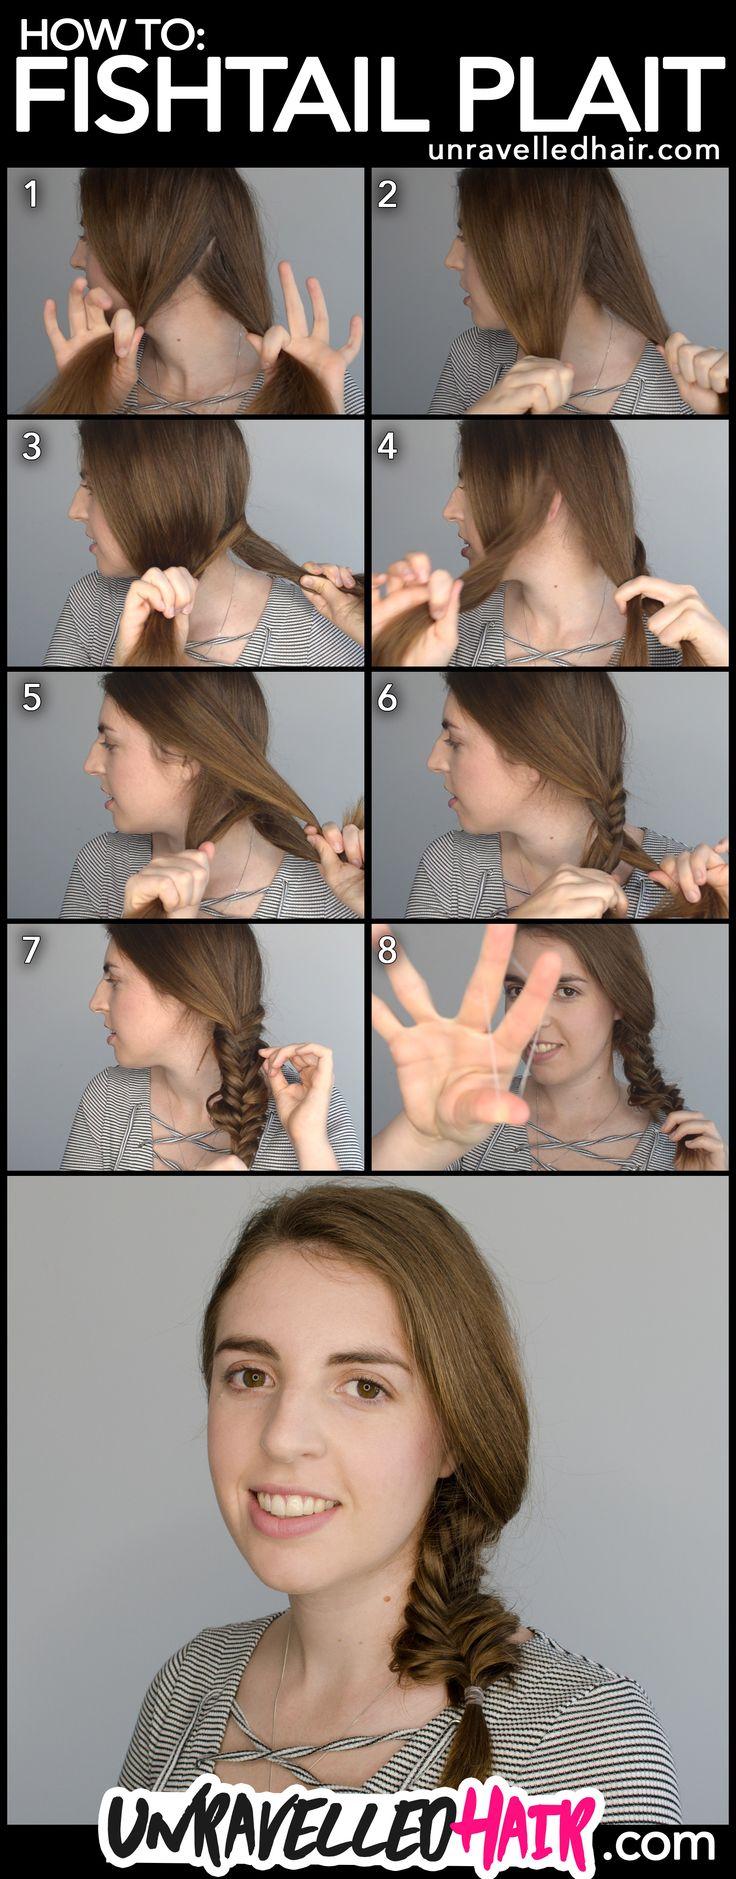 How to Fishtail Plait Steps